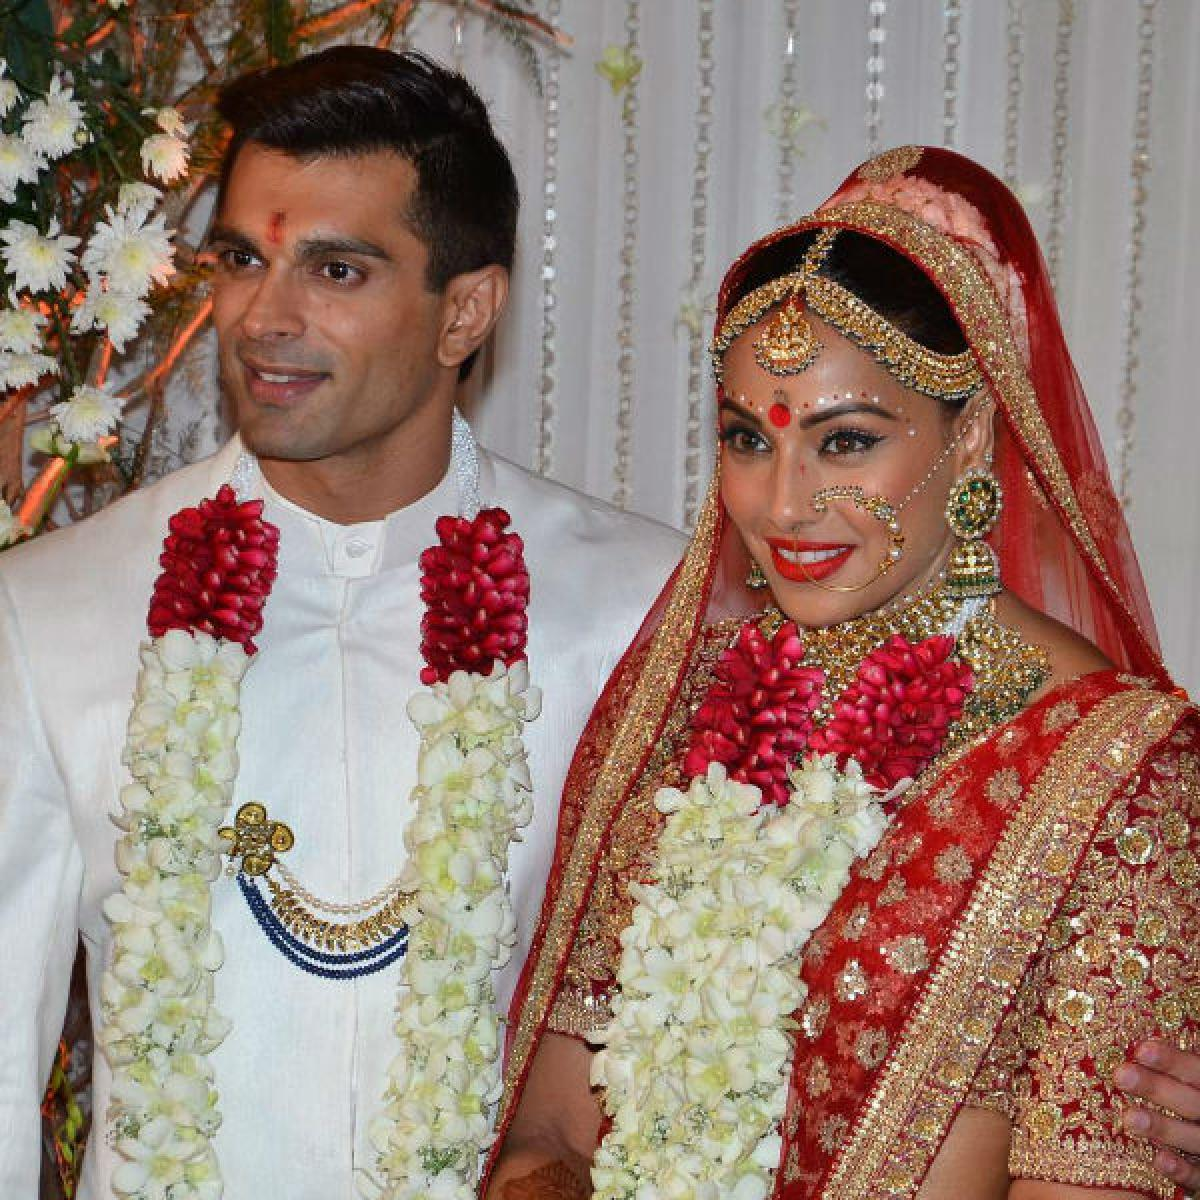 Sneak Peek into Bipasha-Karan wedding photos